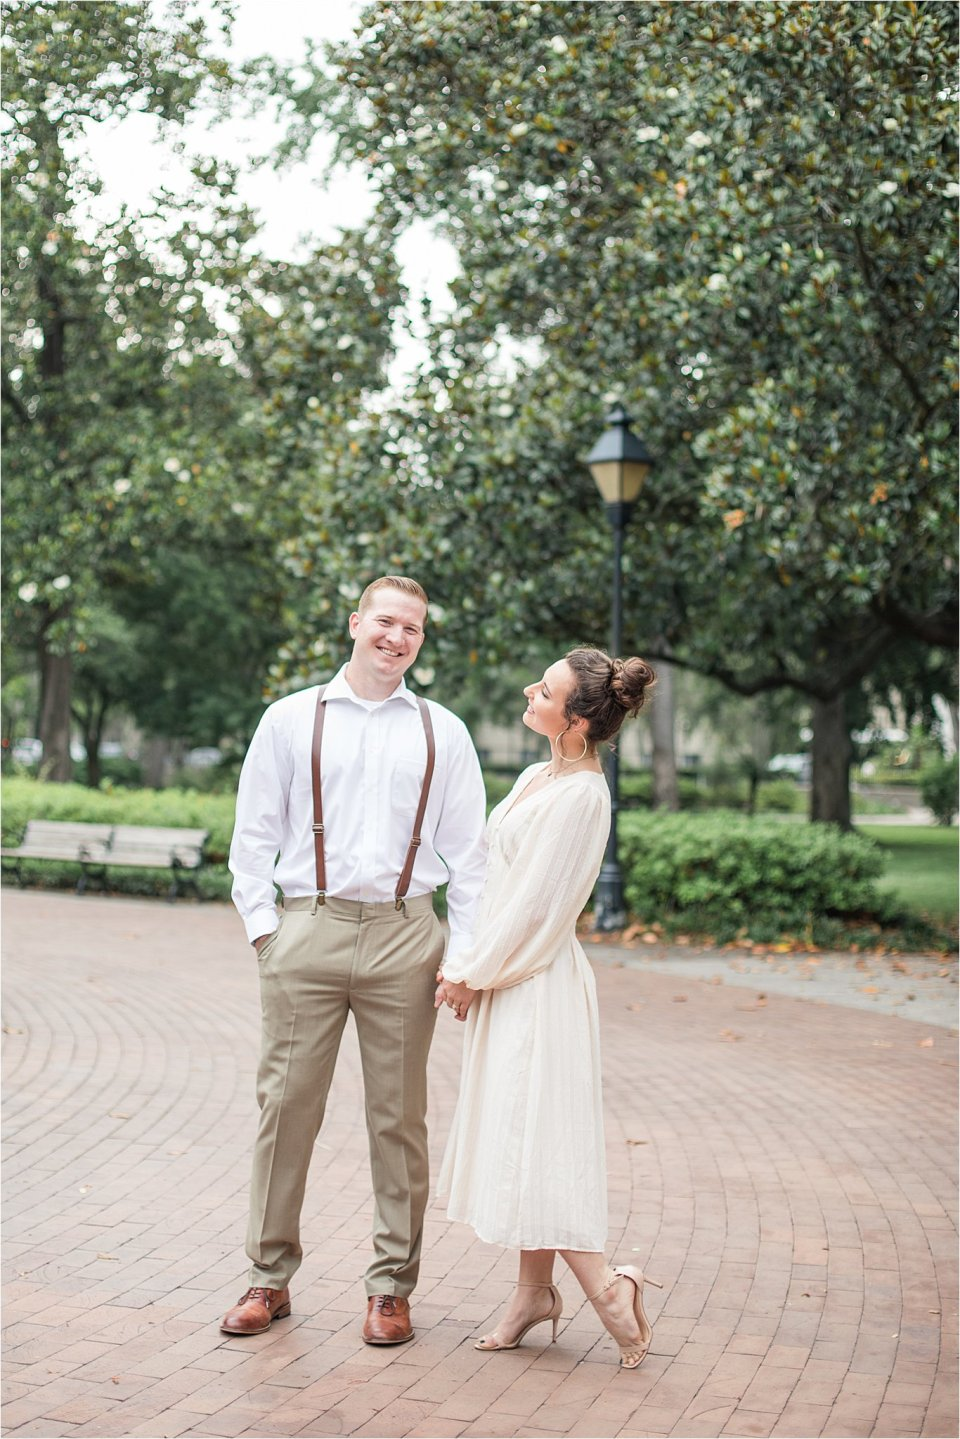 Couple at Forsyth Park in Savannah, GA by destination photographer Karen Shoufler